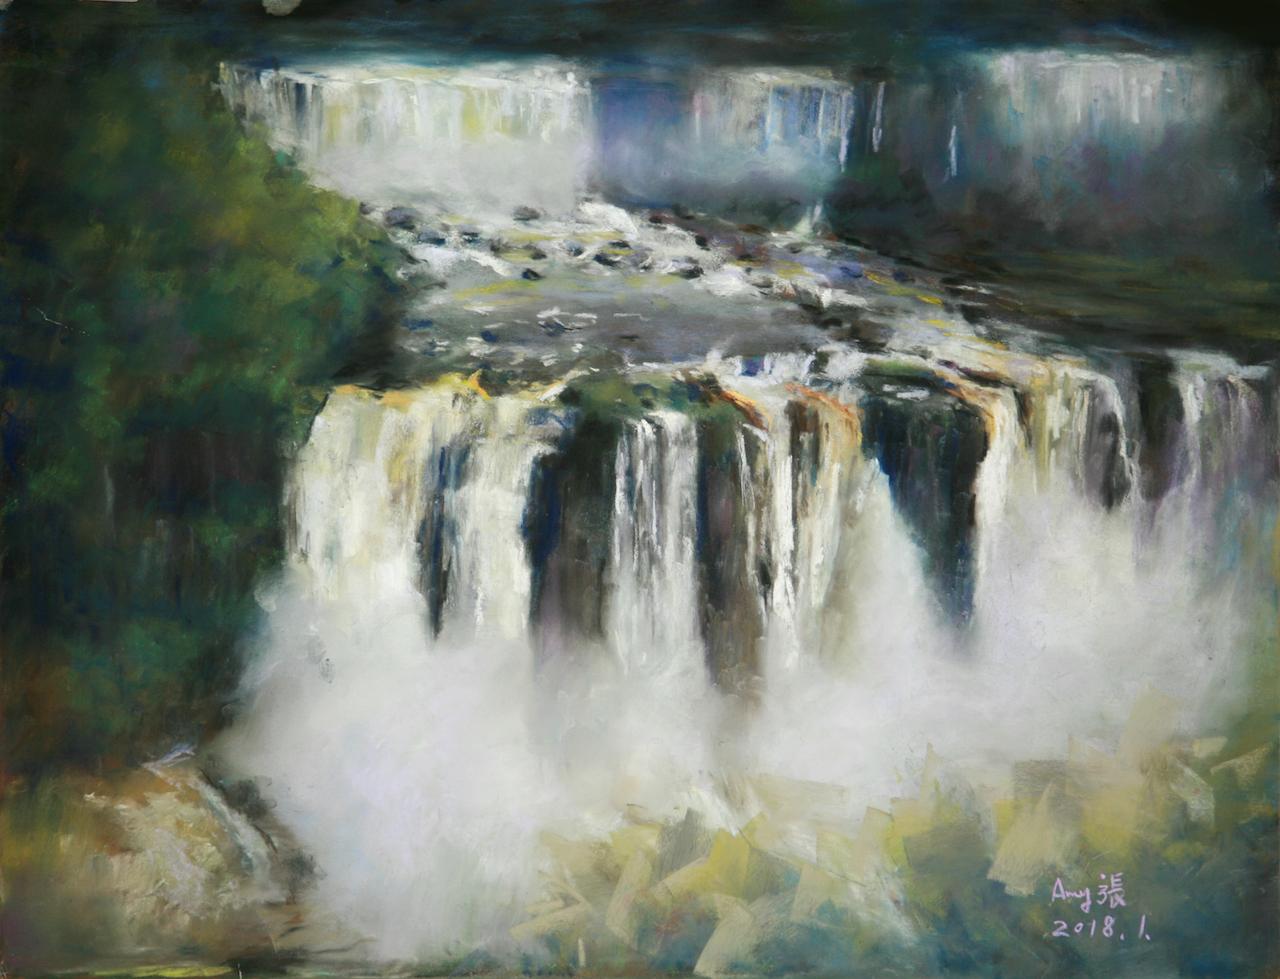 Amy Chang Title: Brazil - Iguazu Falls Size: 18 x 14 Price: $1800